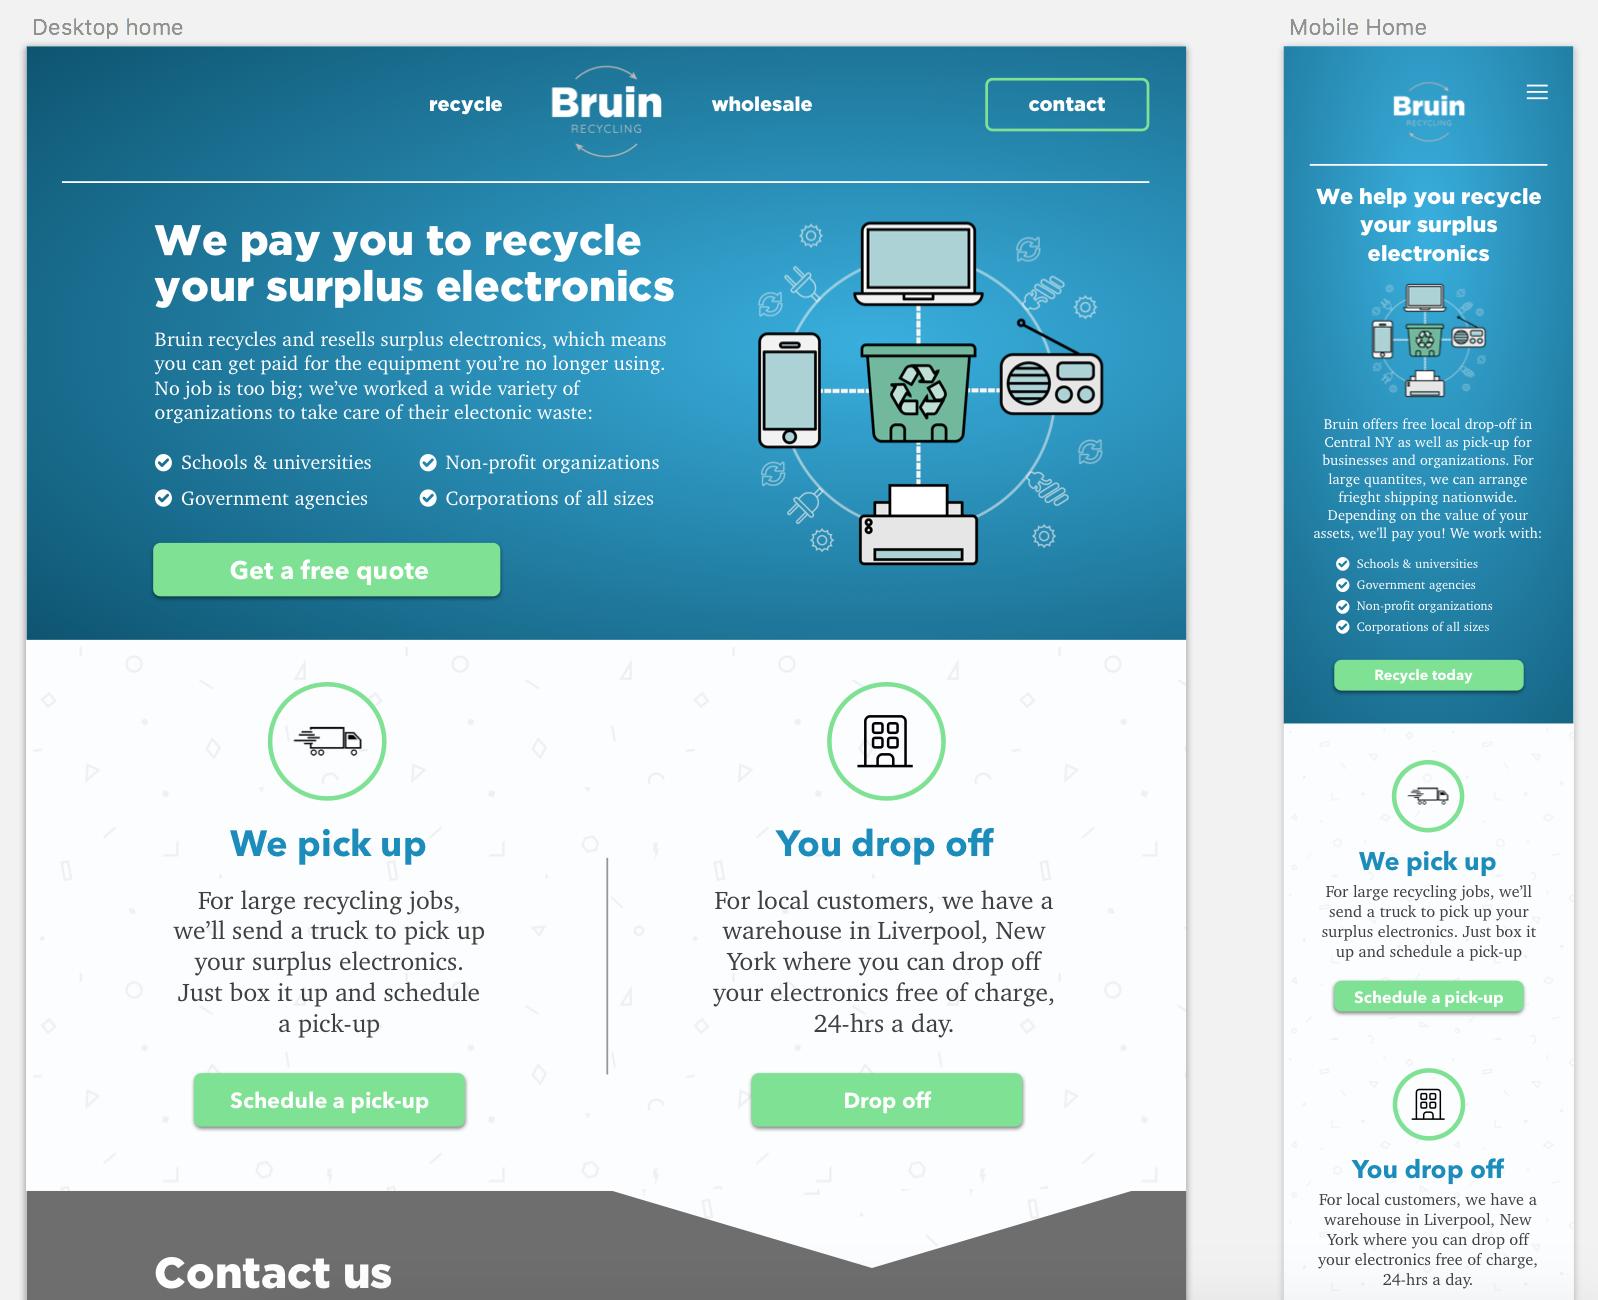 Bruin web page